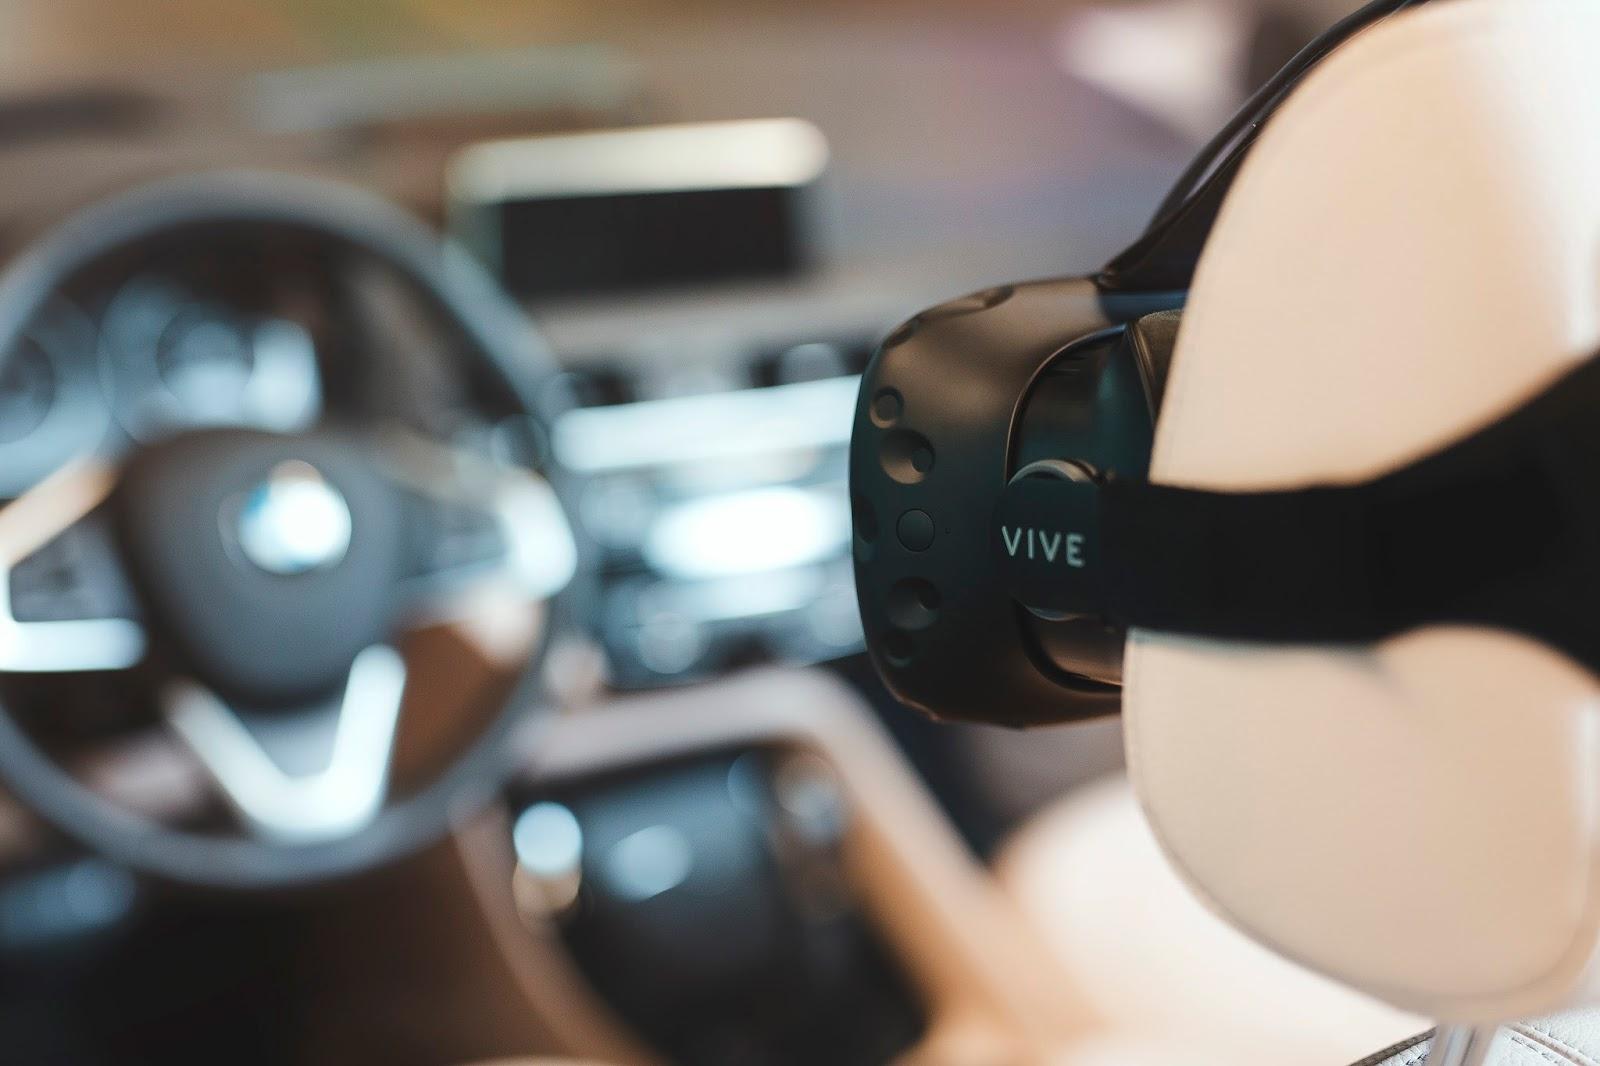 P90214936 highRes the virtual reality 1 1 Που χρησιμοποιεί η BMW το Unreal Engine 4 της Epic Games και τα συστήματα εικονικής πραγματικότητας BMW, HTC, Virtual Reality, Τεχνολογία